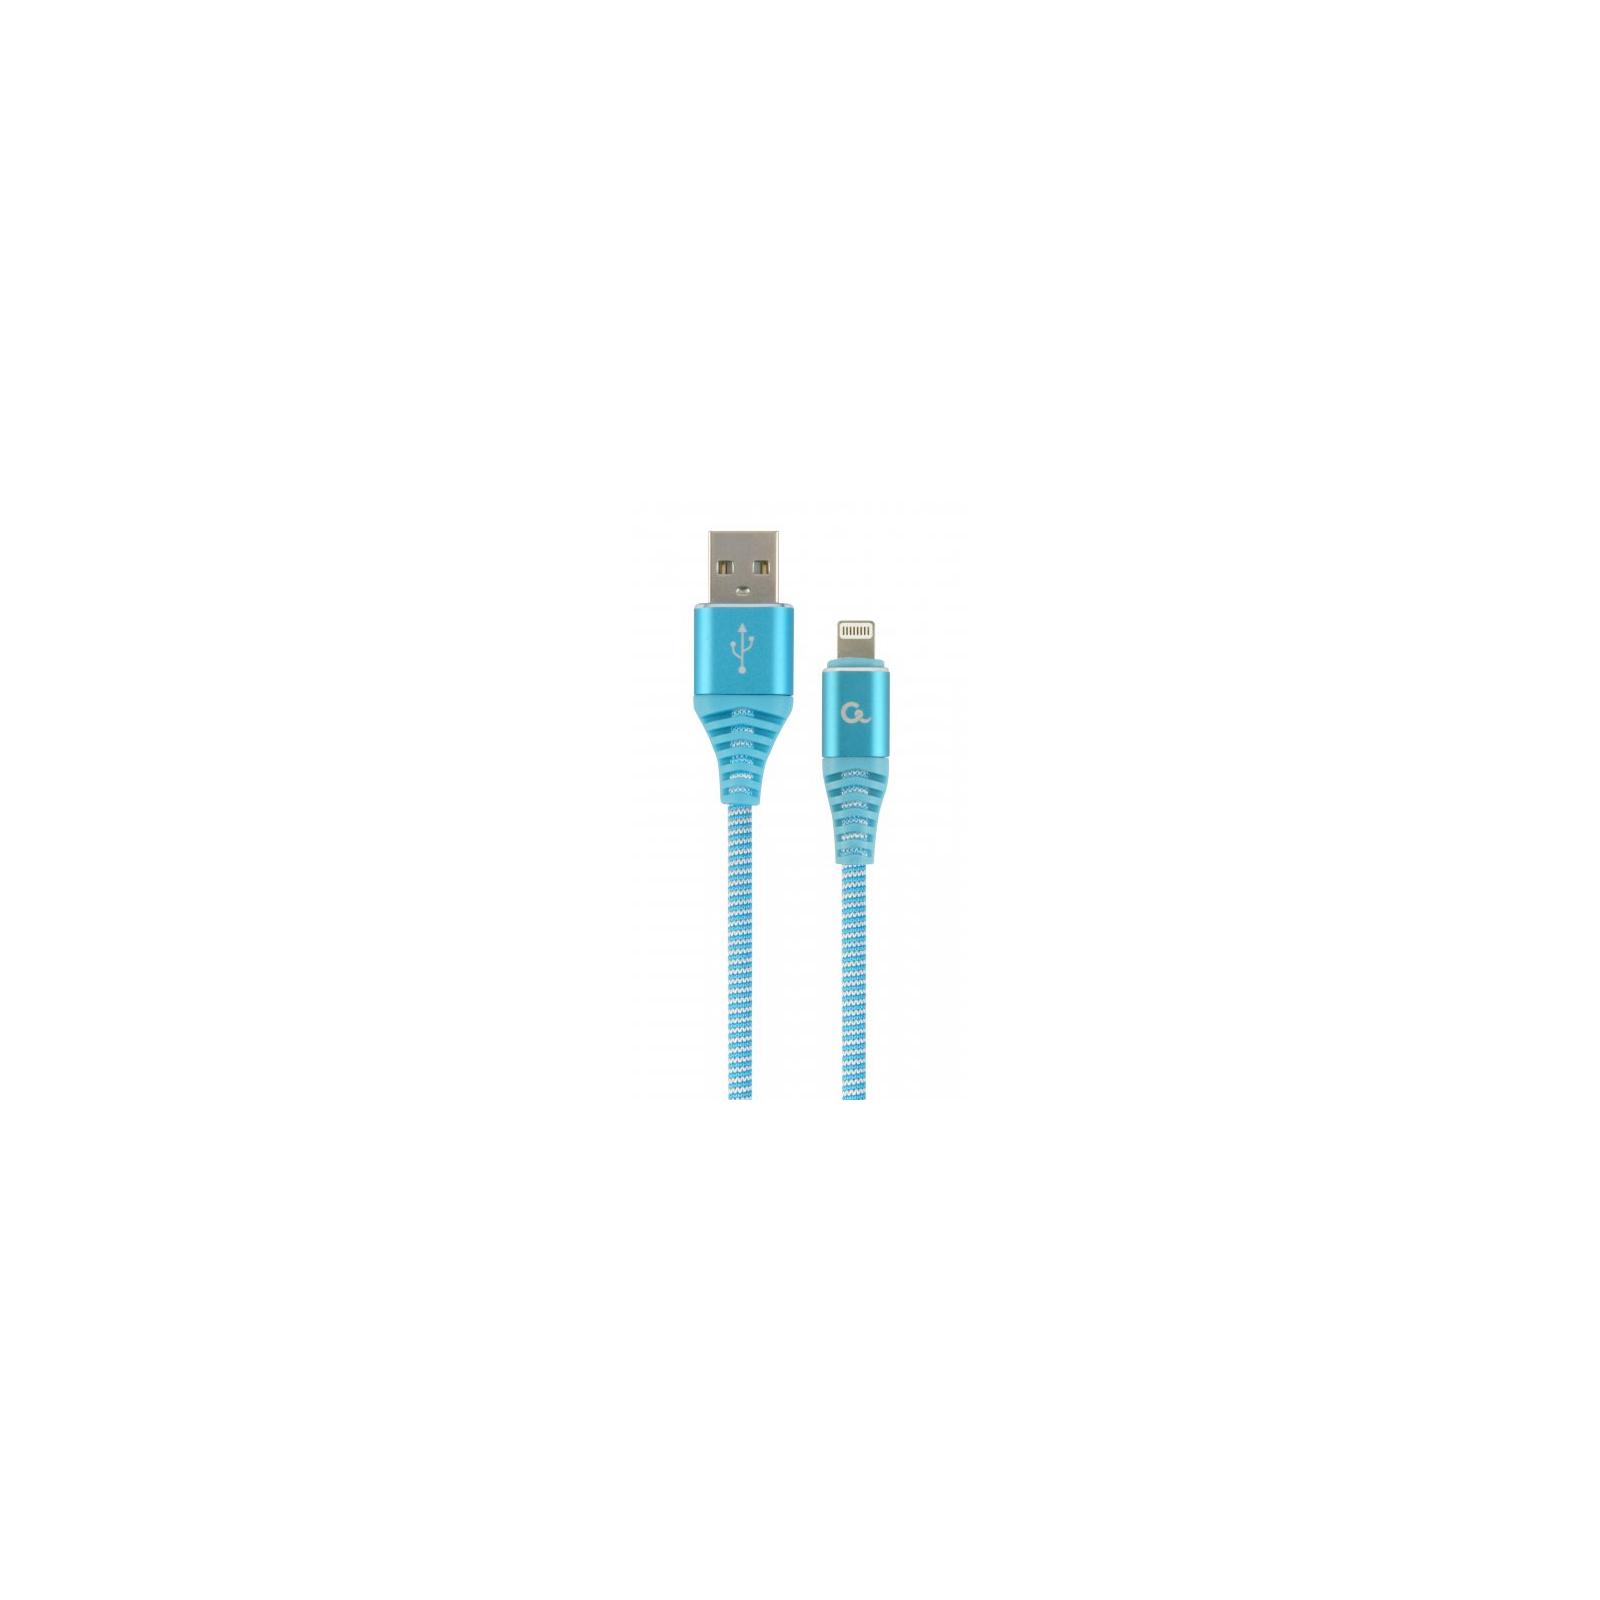 Дата кабель USB 2.0 AM to Lightning 2.0m Cablexpert (CC-USB2B-AMLM-2M-PW)